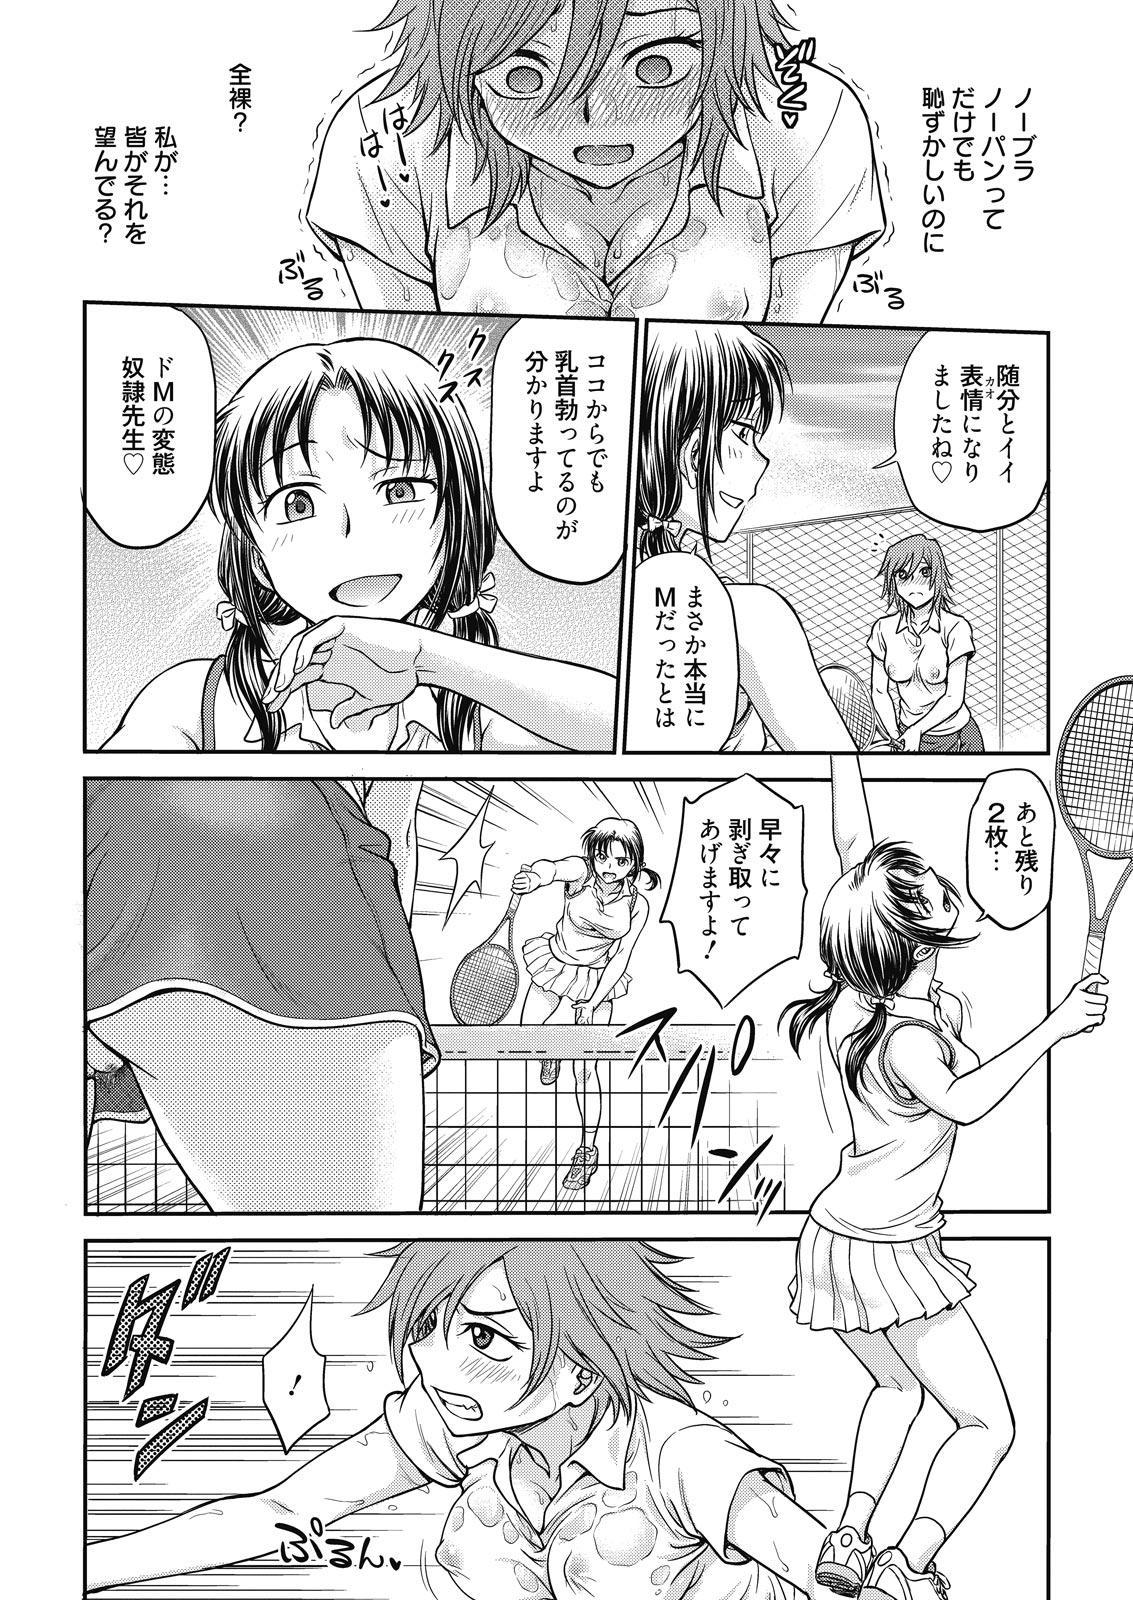 Web Manga Bangaichi Vol. 7 75